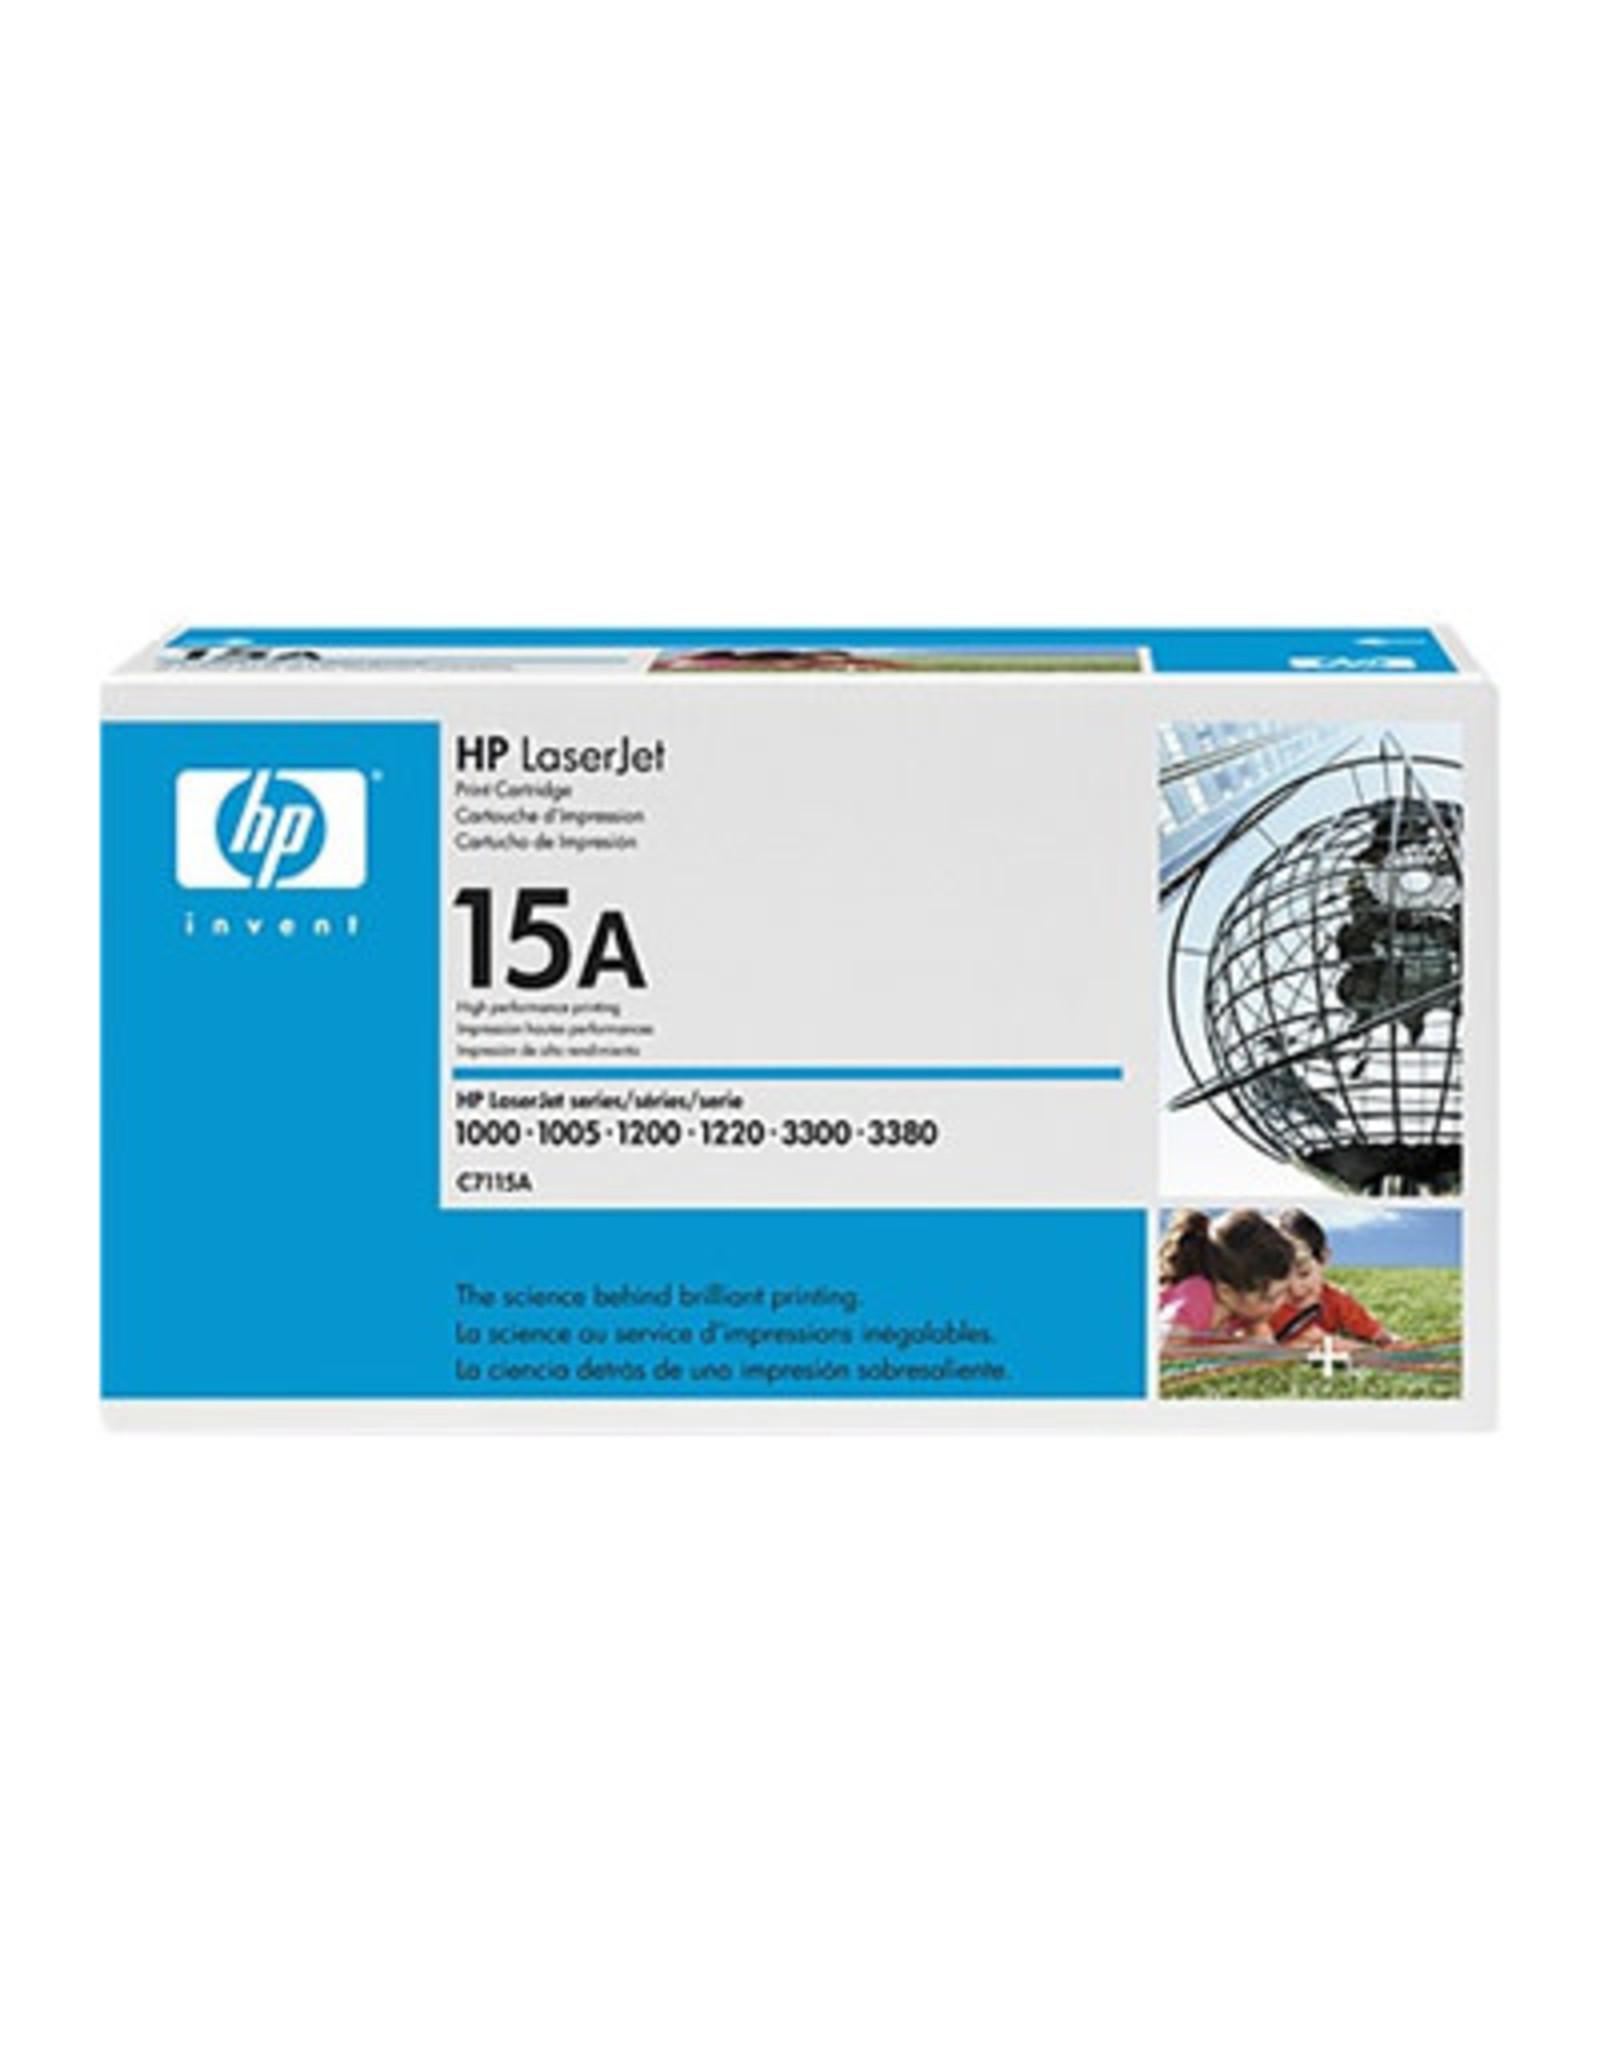 HP LASER TONER-HP #15A BLACK